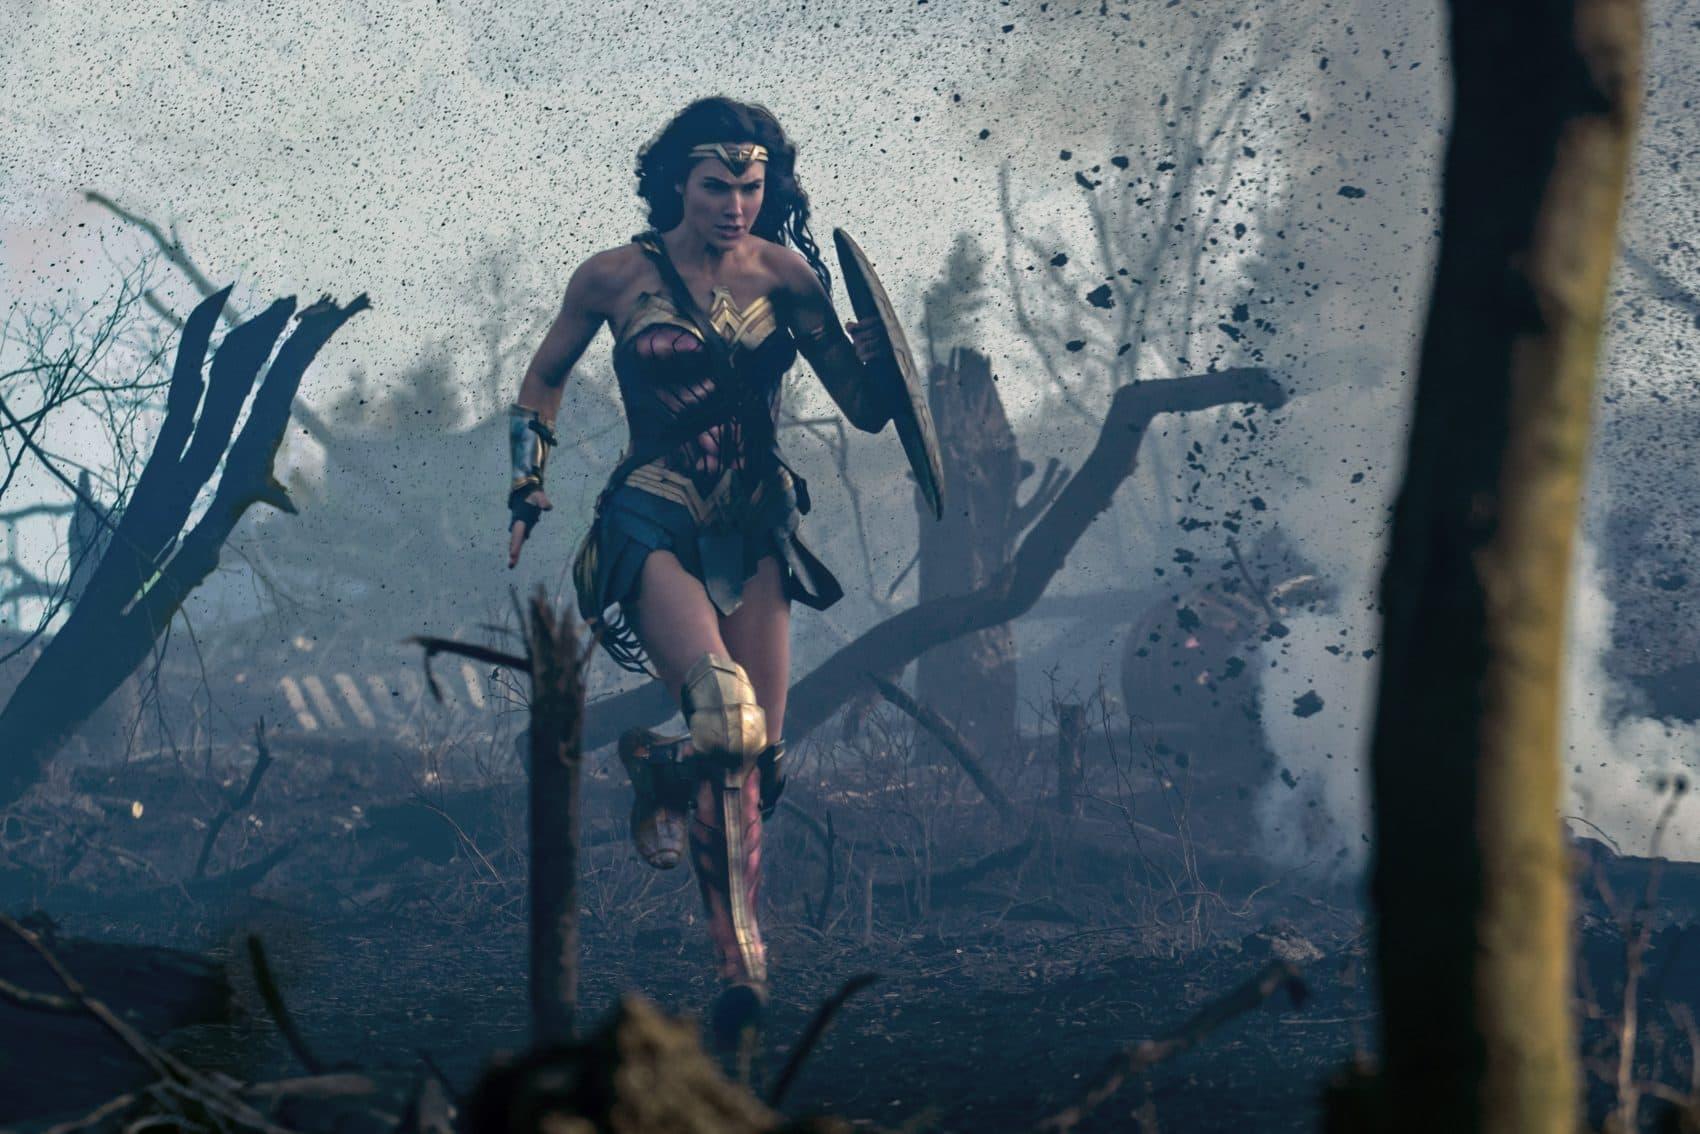 Gal Gadot as Wonder Woman. (Clay Enos/Warner Bros. Pictures)